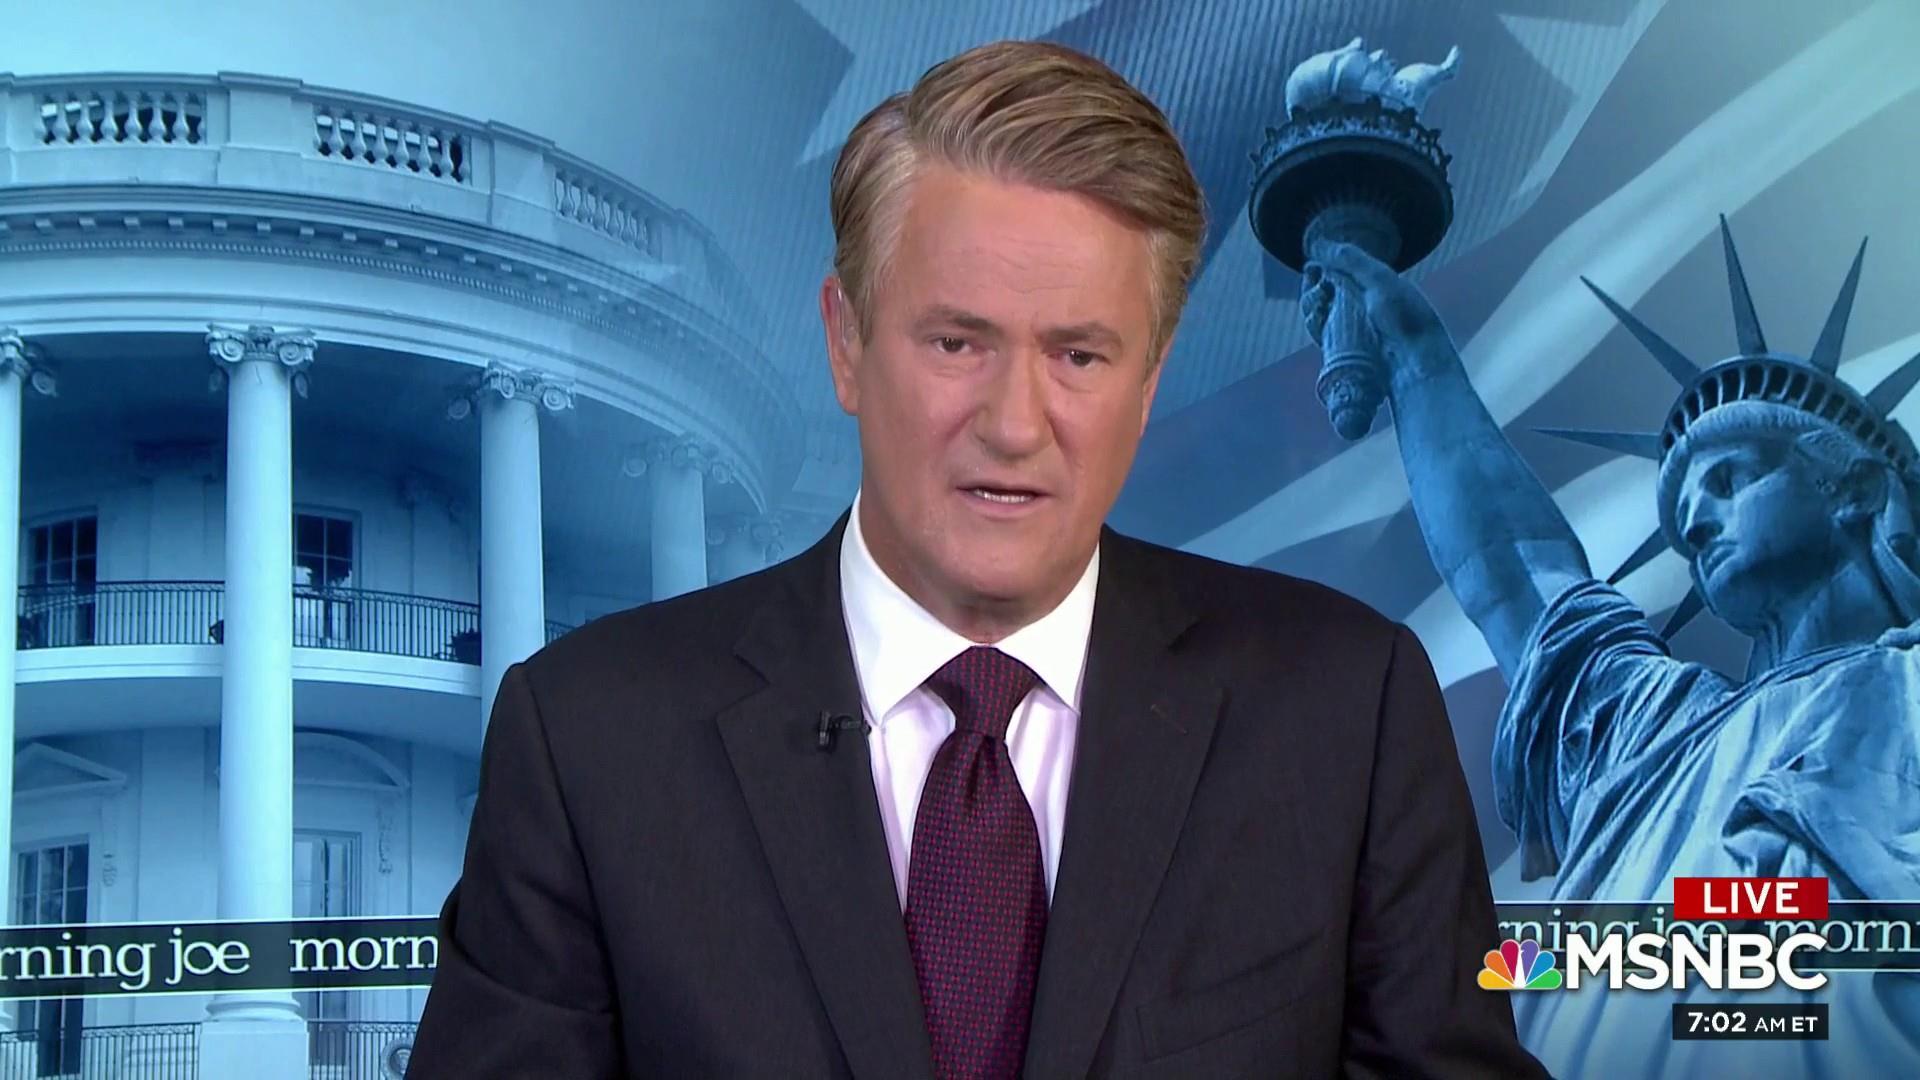 Joe on primaries: Trump is kingmaker, Dems shift left